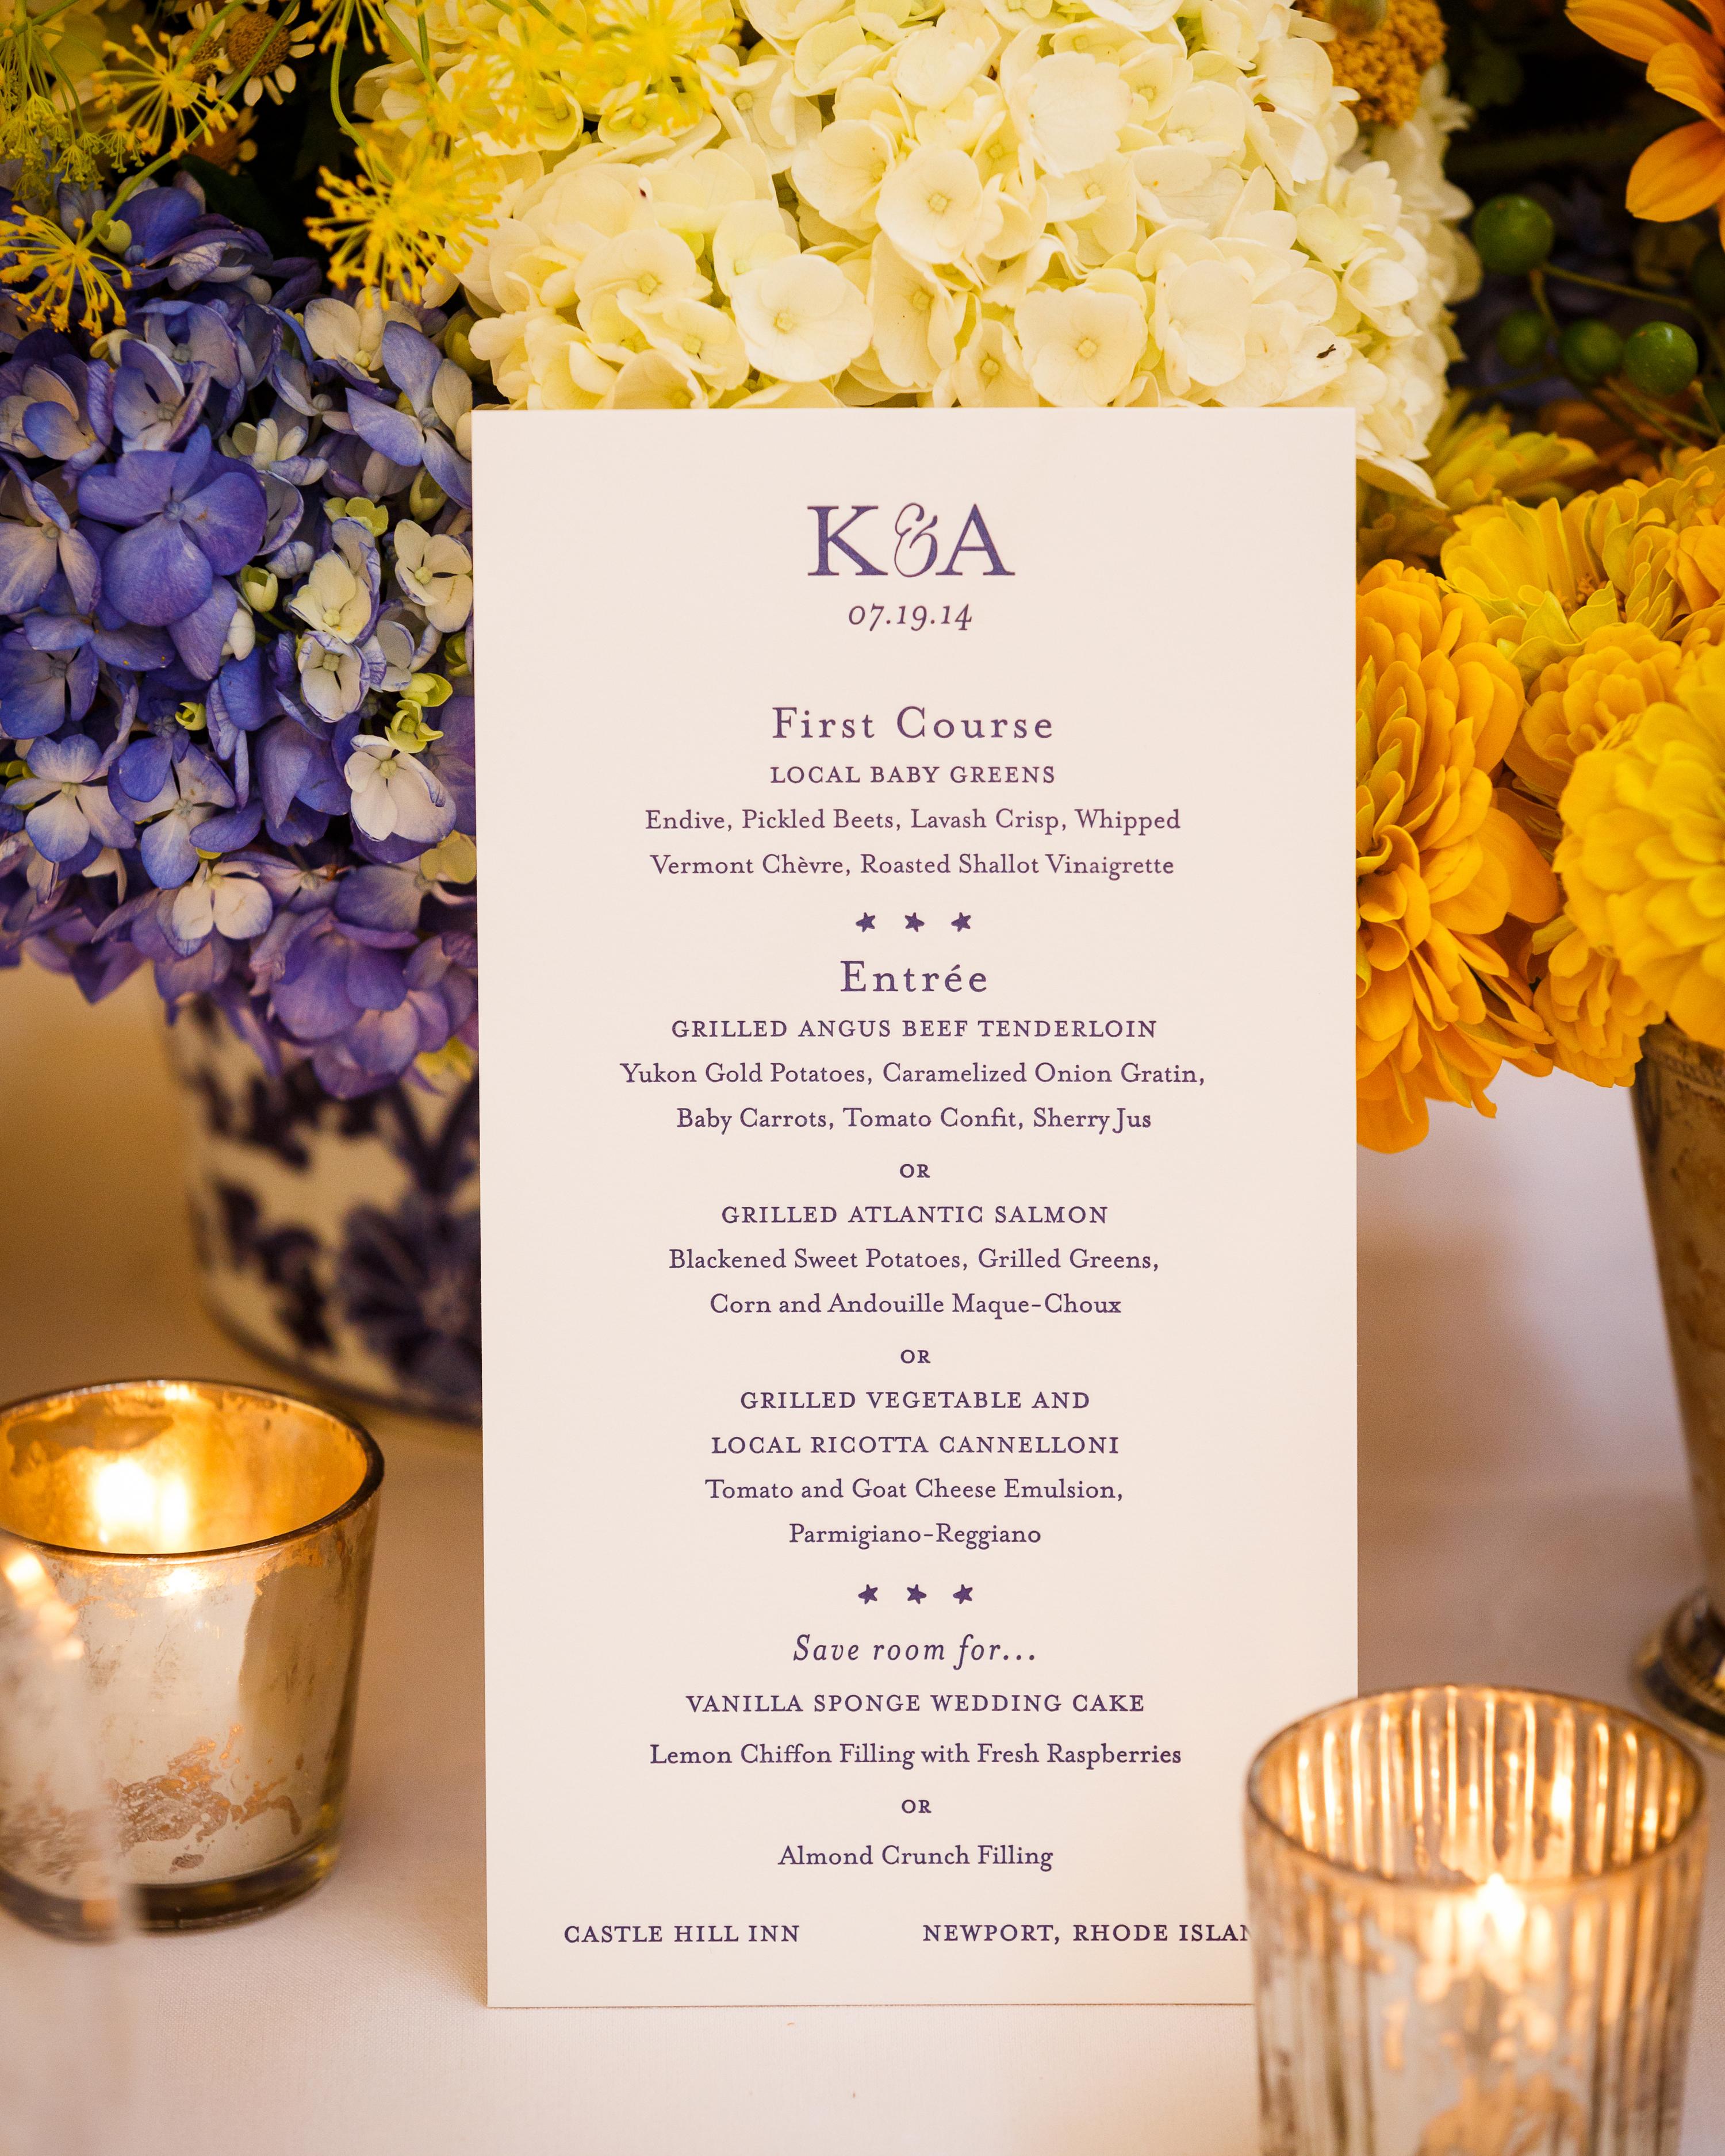 kristel-austin-wedding-menu-0963-s11860-0415.jpg